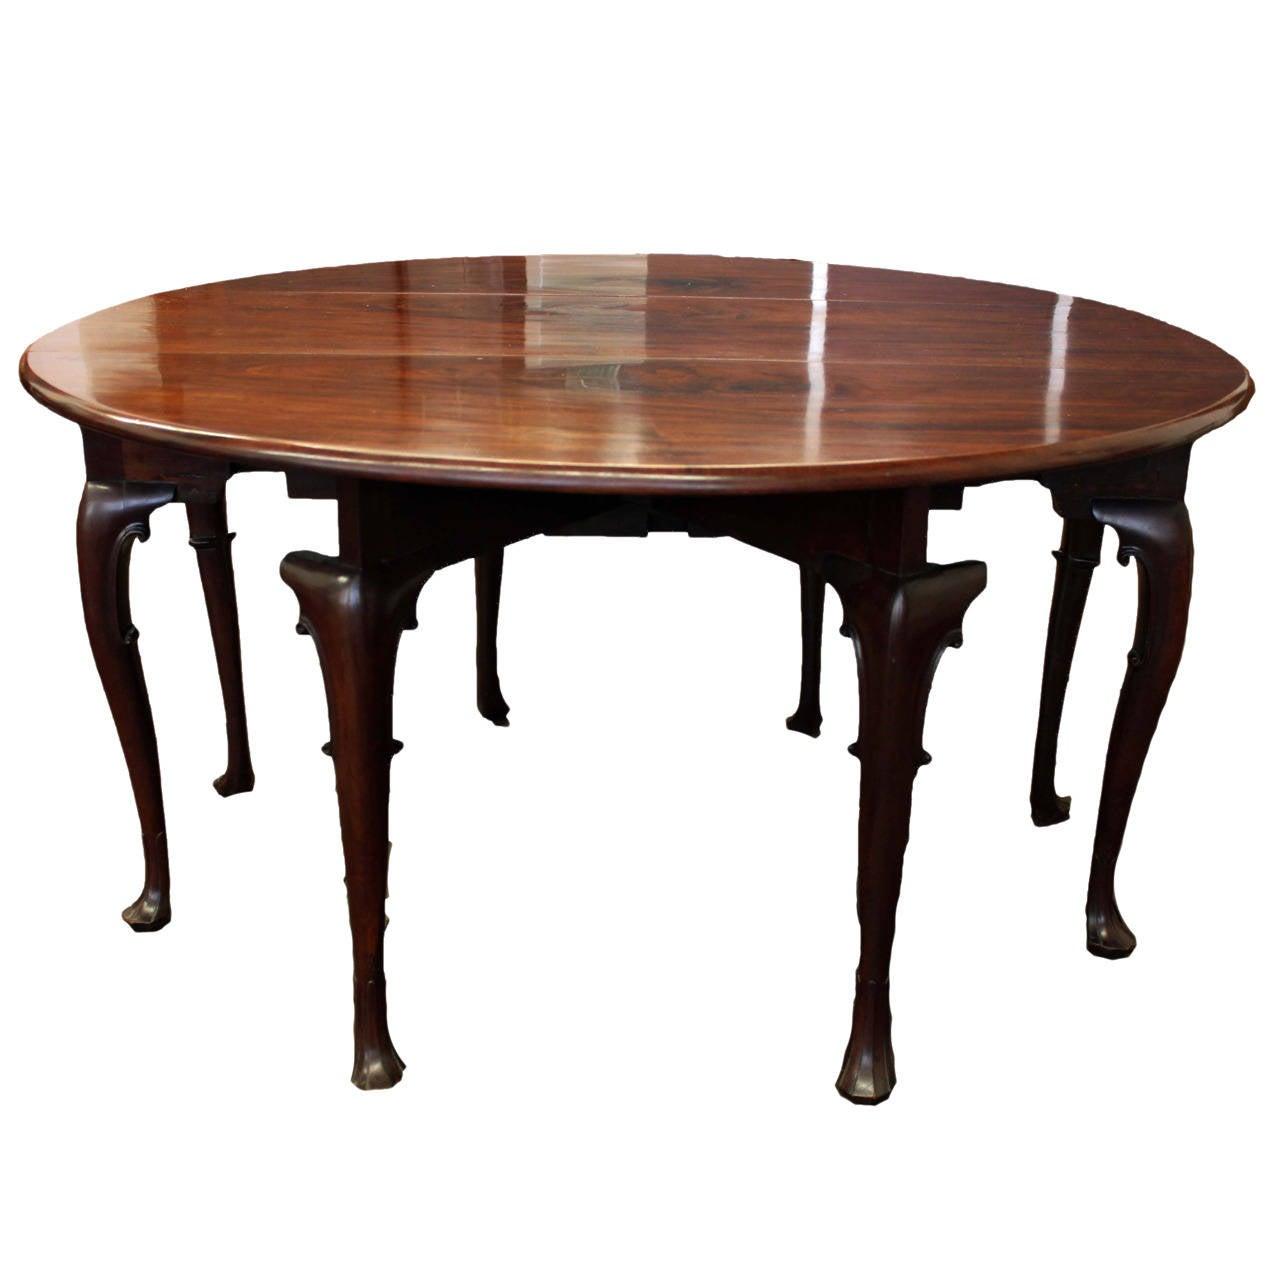 George II Mahogany Gate Leg Drop Side Table For Sale at  : Dropsidetableal from www.1stdibs.com size 1280 x 1280 jpeg 76kB